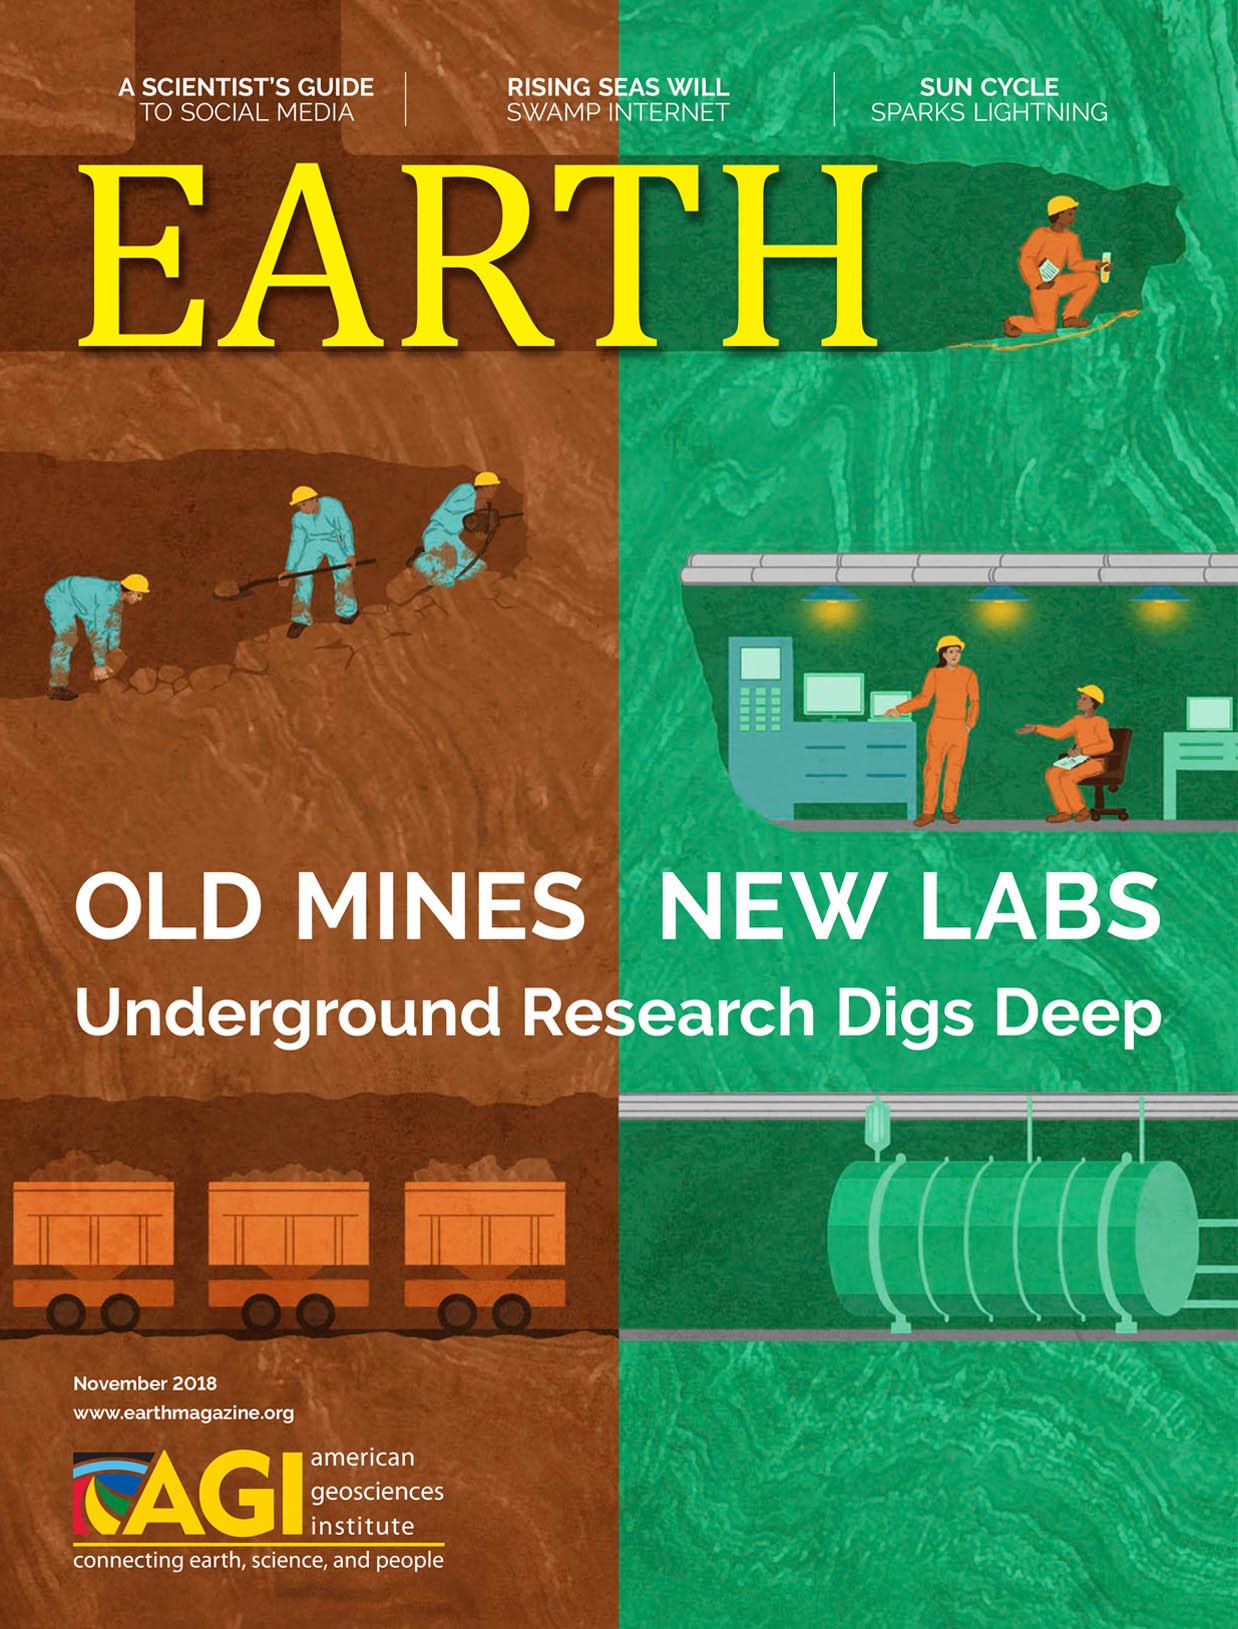 November 2018  EARTH Magazine, layout by Nicole Schmidgall  www.nicoleschmidgall.com